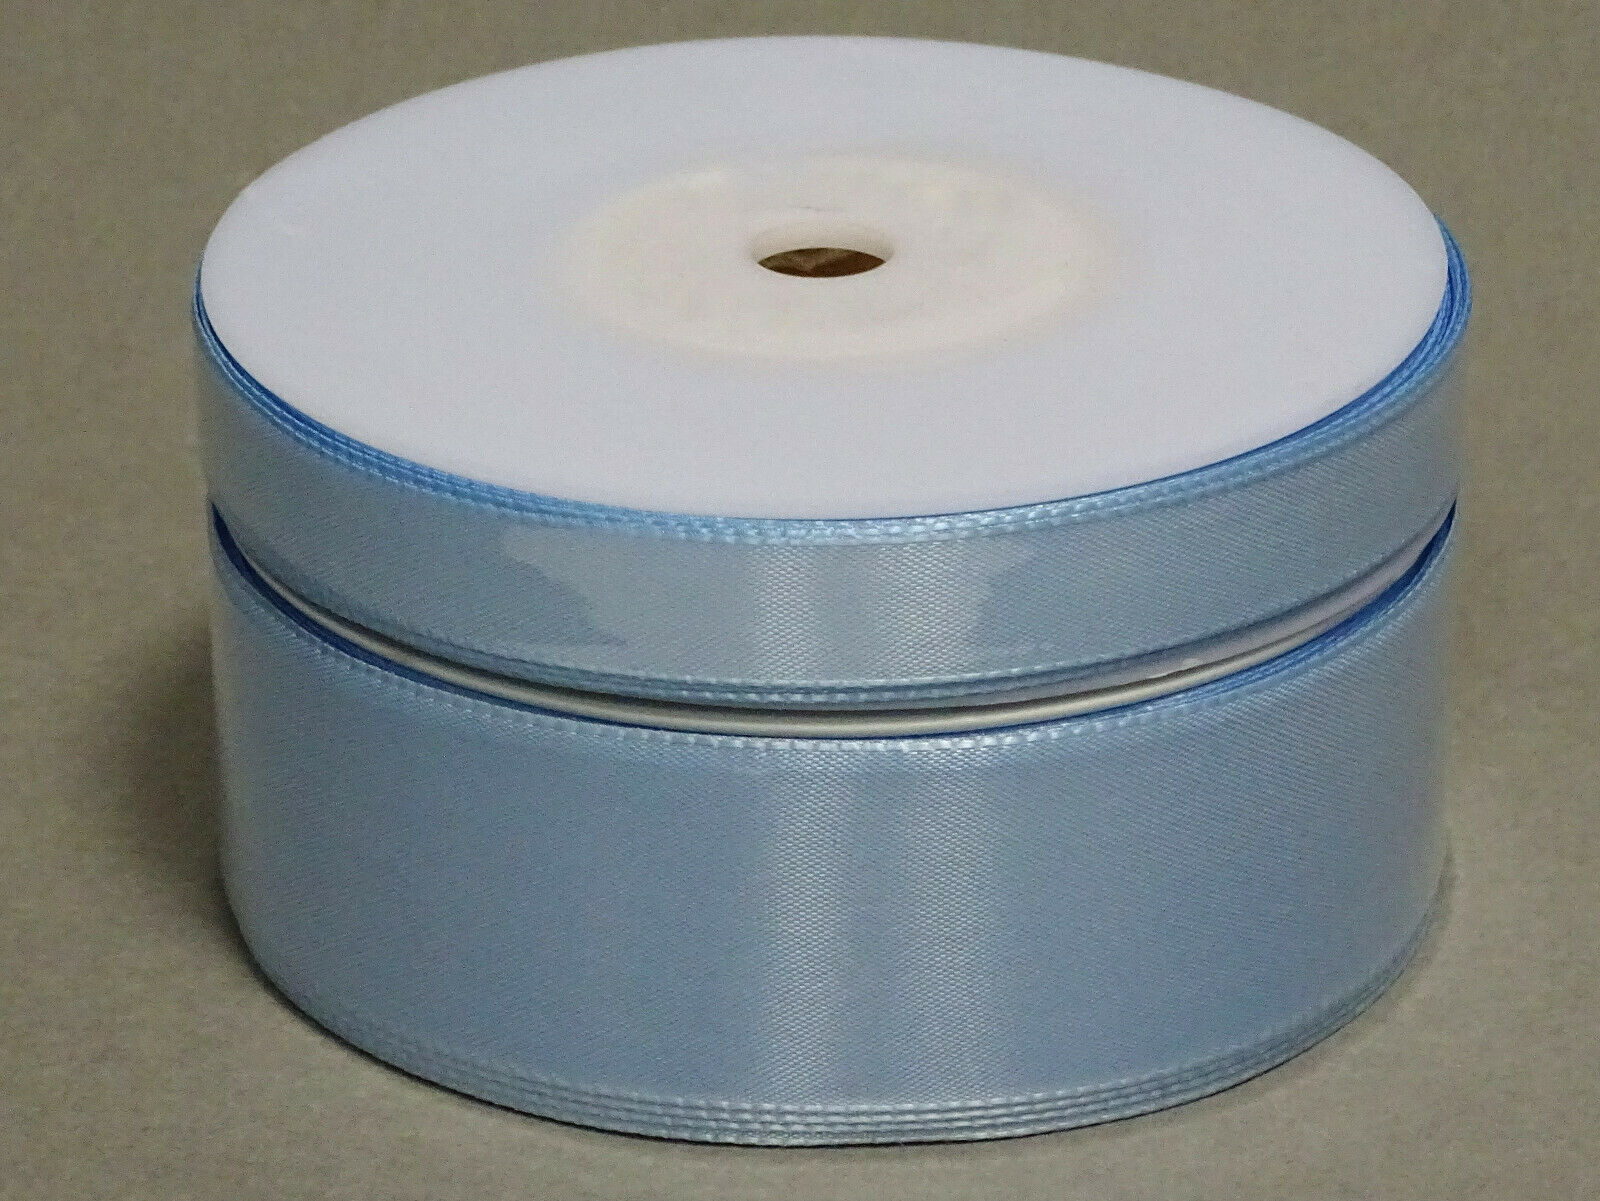 Seidenband Schleifenband 50 m x 15 mm / 40 mm Dekoband ab 0,08 €/m Geschenkband  - Hellblau 754, 15 mm x 50 m